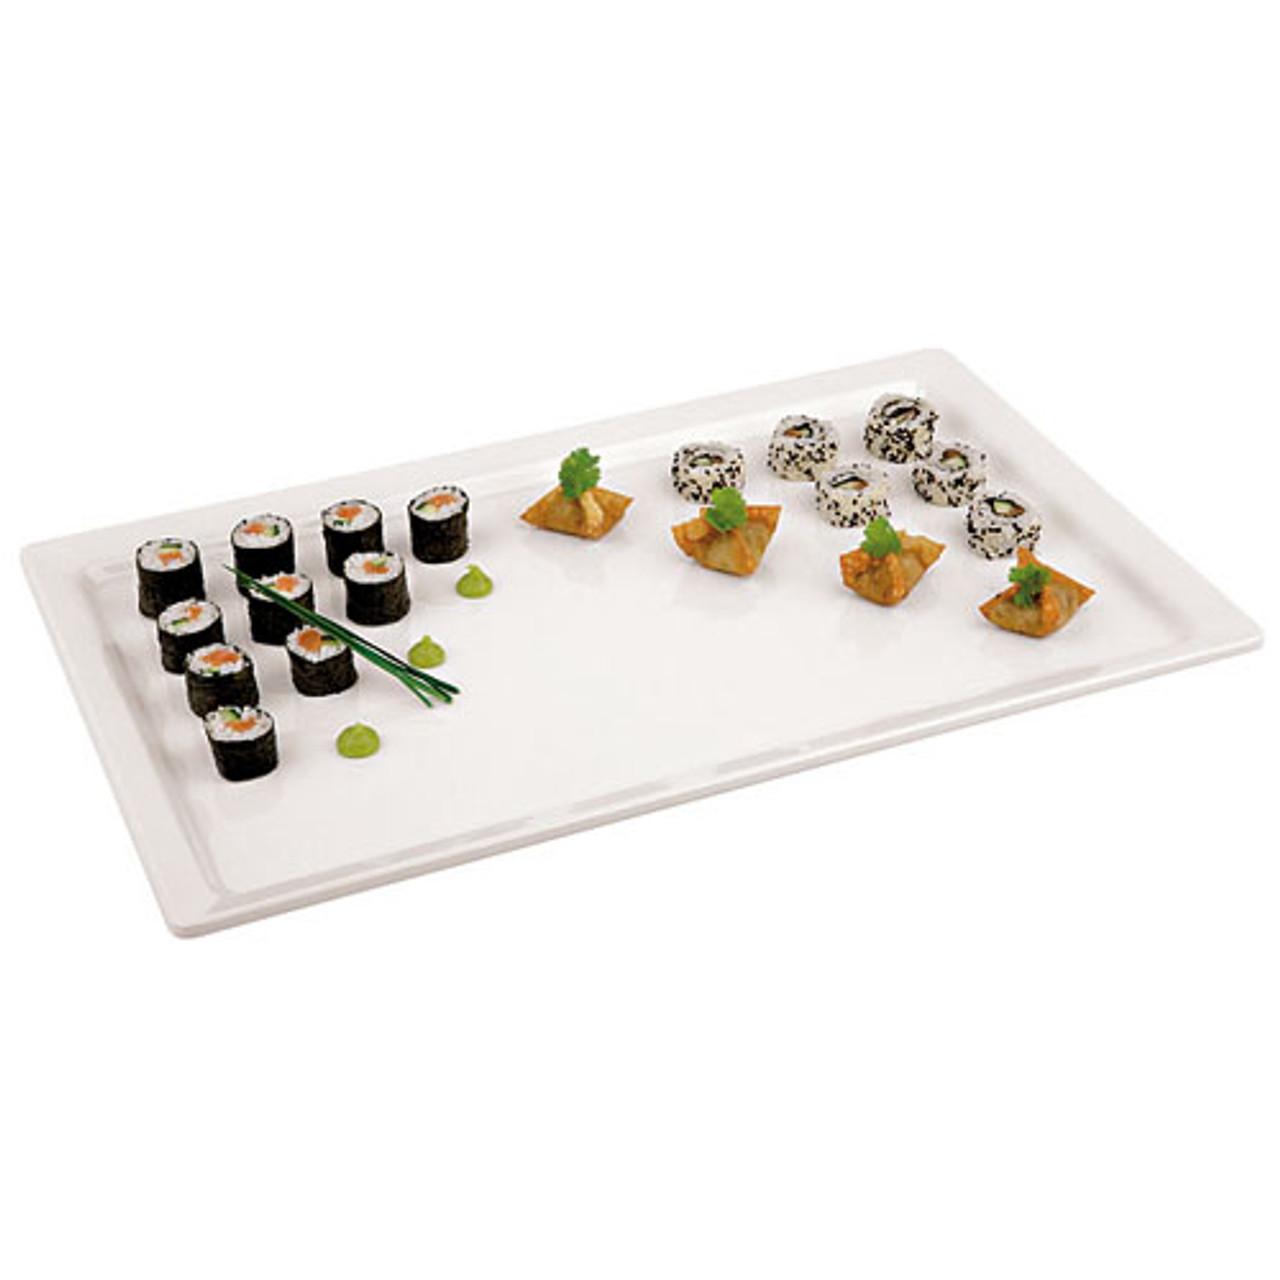 White Melamine Platter - (1/1 ) , L 20.875 x W 12.875 x H 0.5